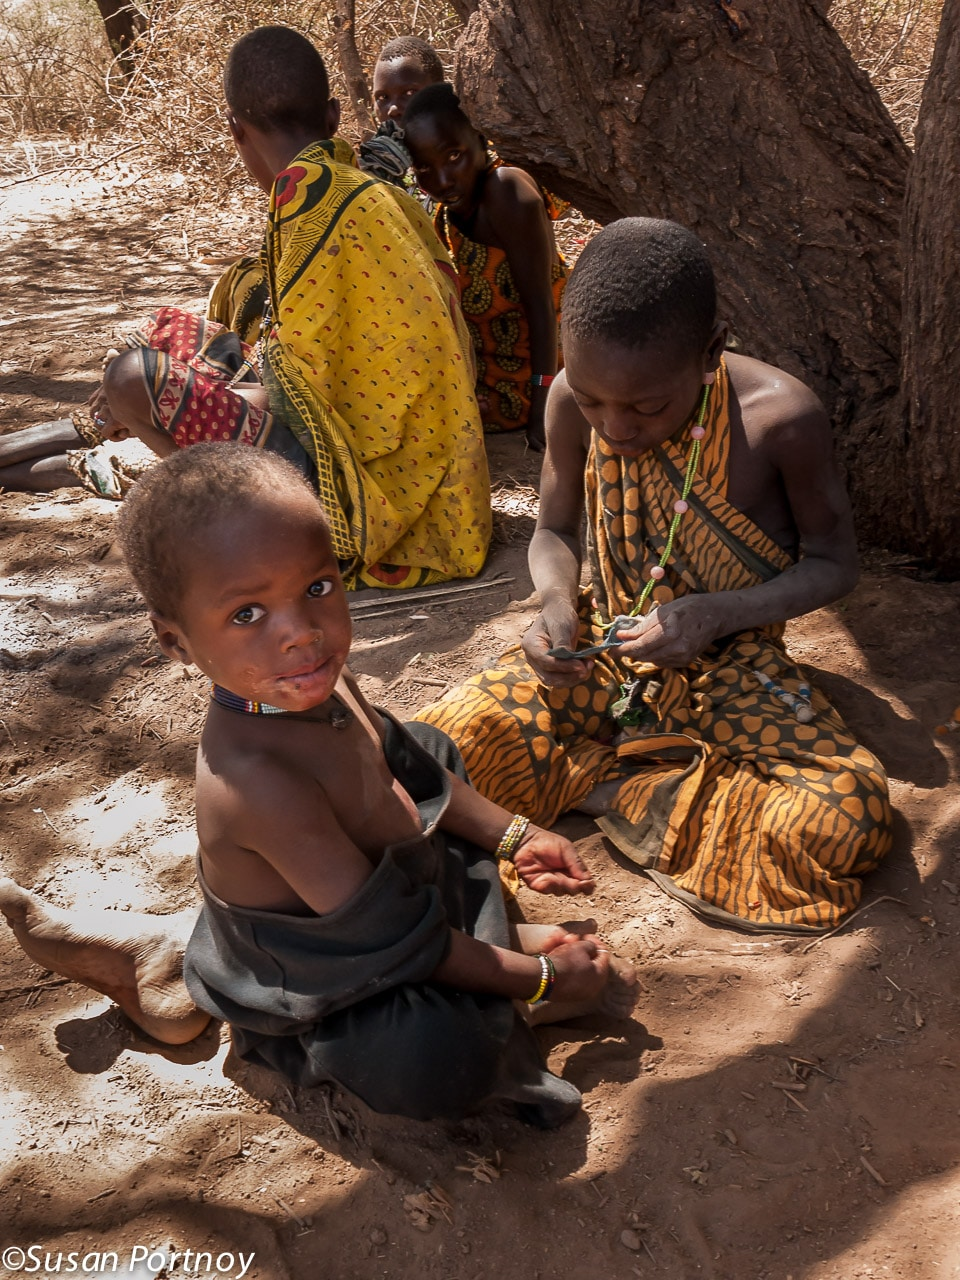 Young Hadzabe children playing